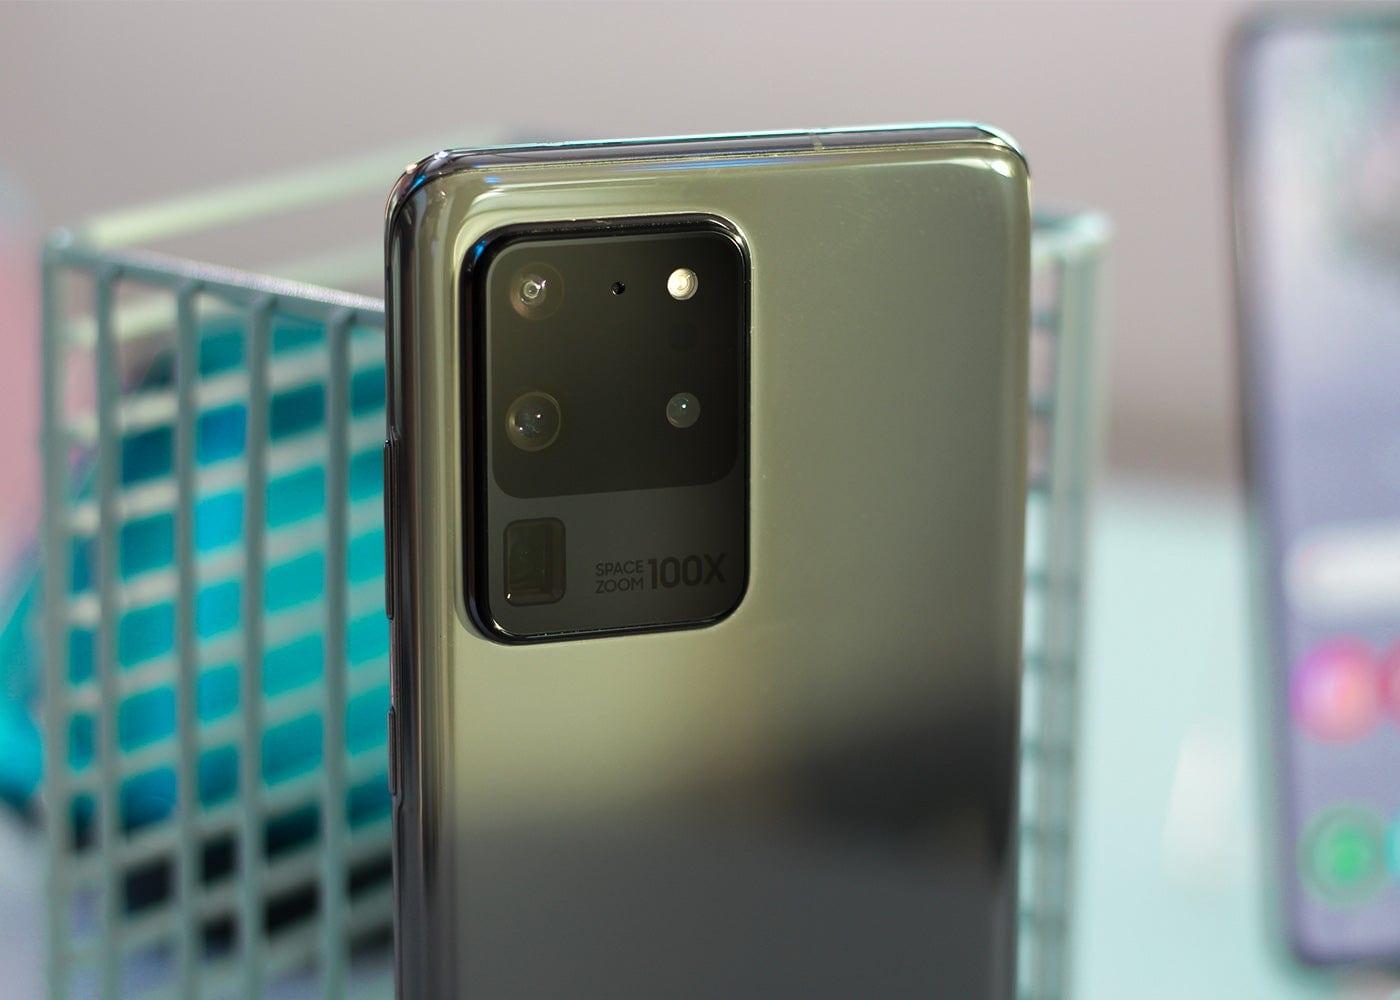 Samsung Galaxy S20 Ultra, rear cameras